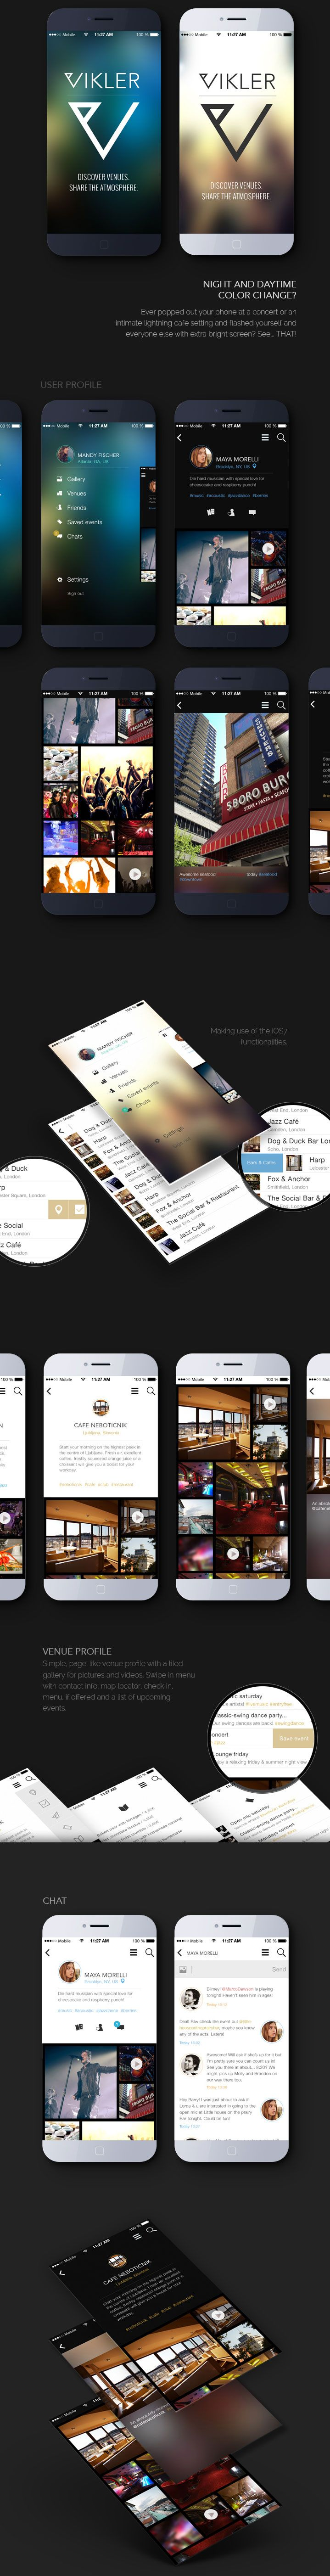 Vikler #mobile application design - #ui